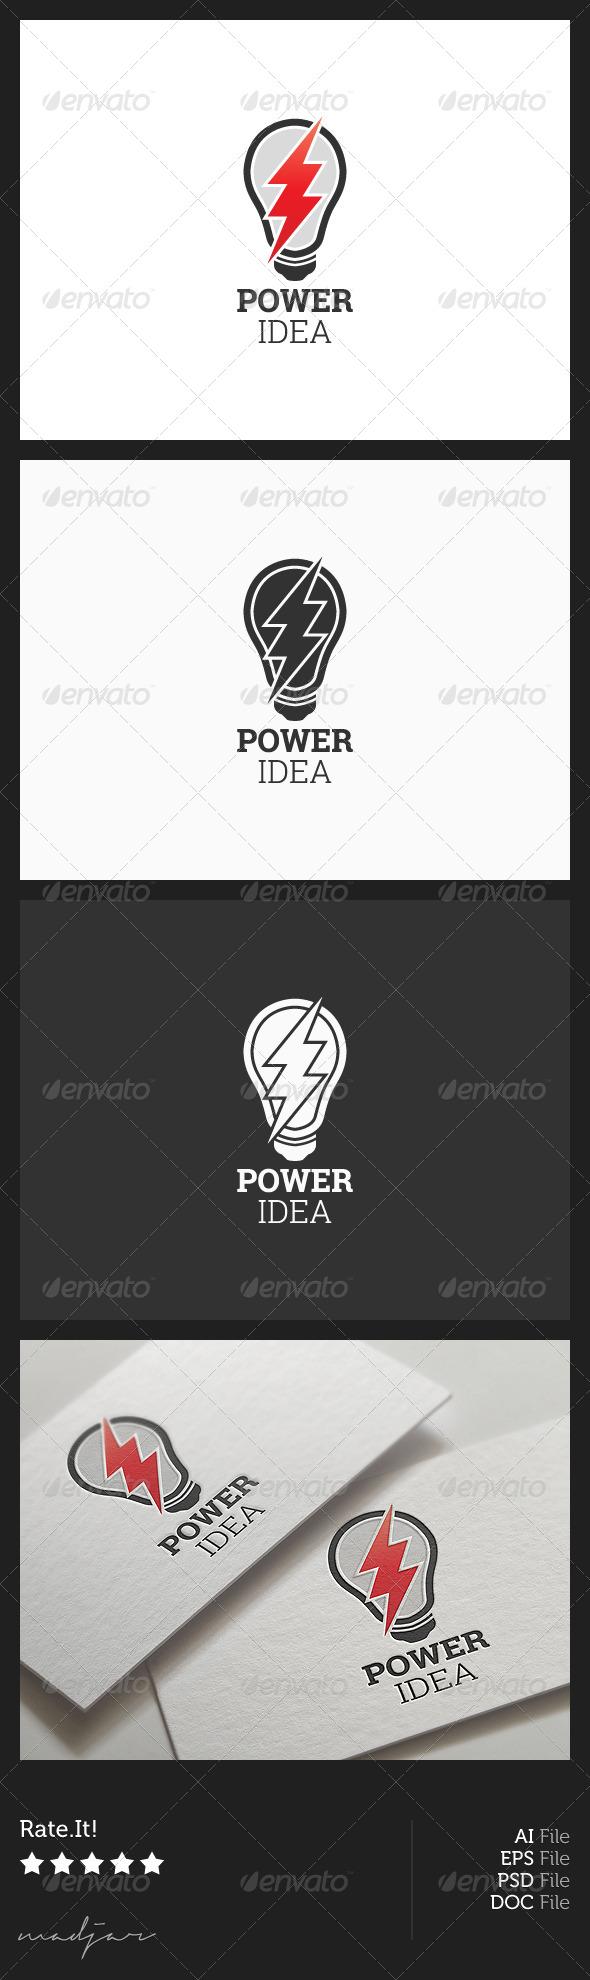 Power Idea Logo - Symbols Logo Templates